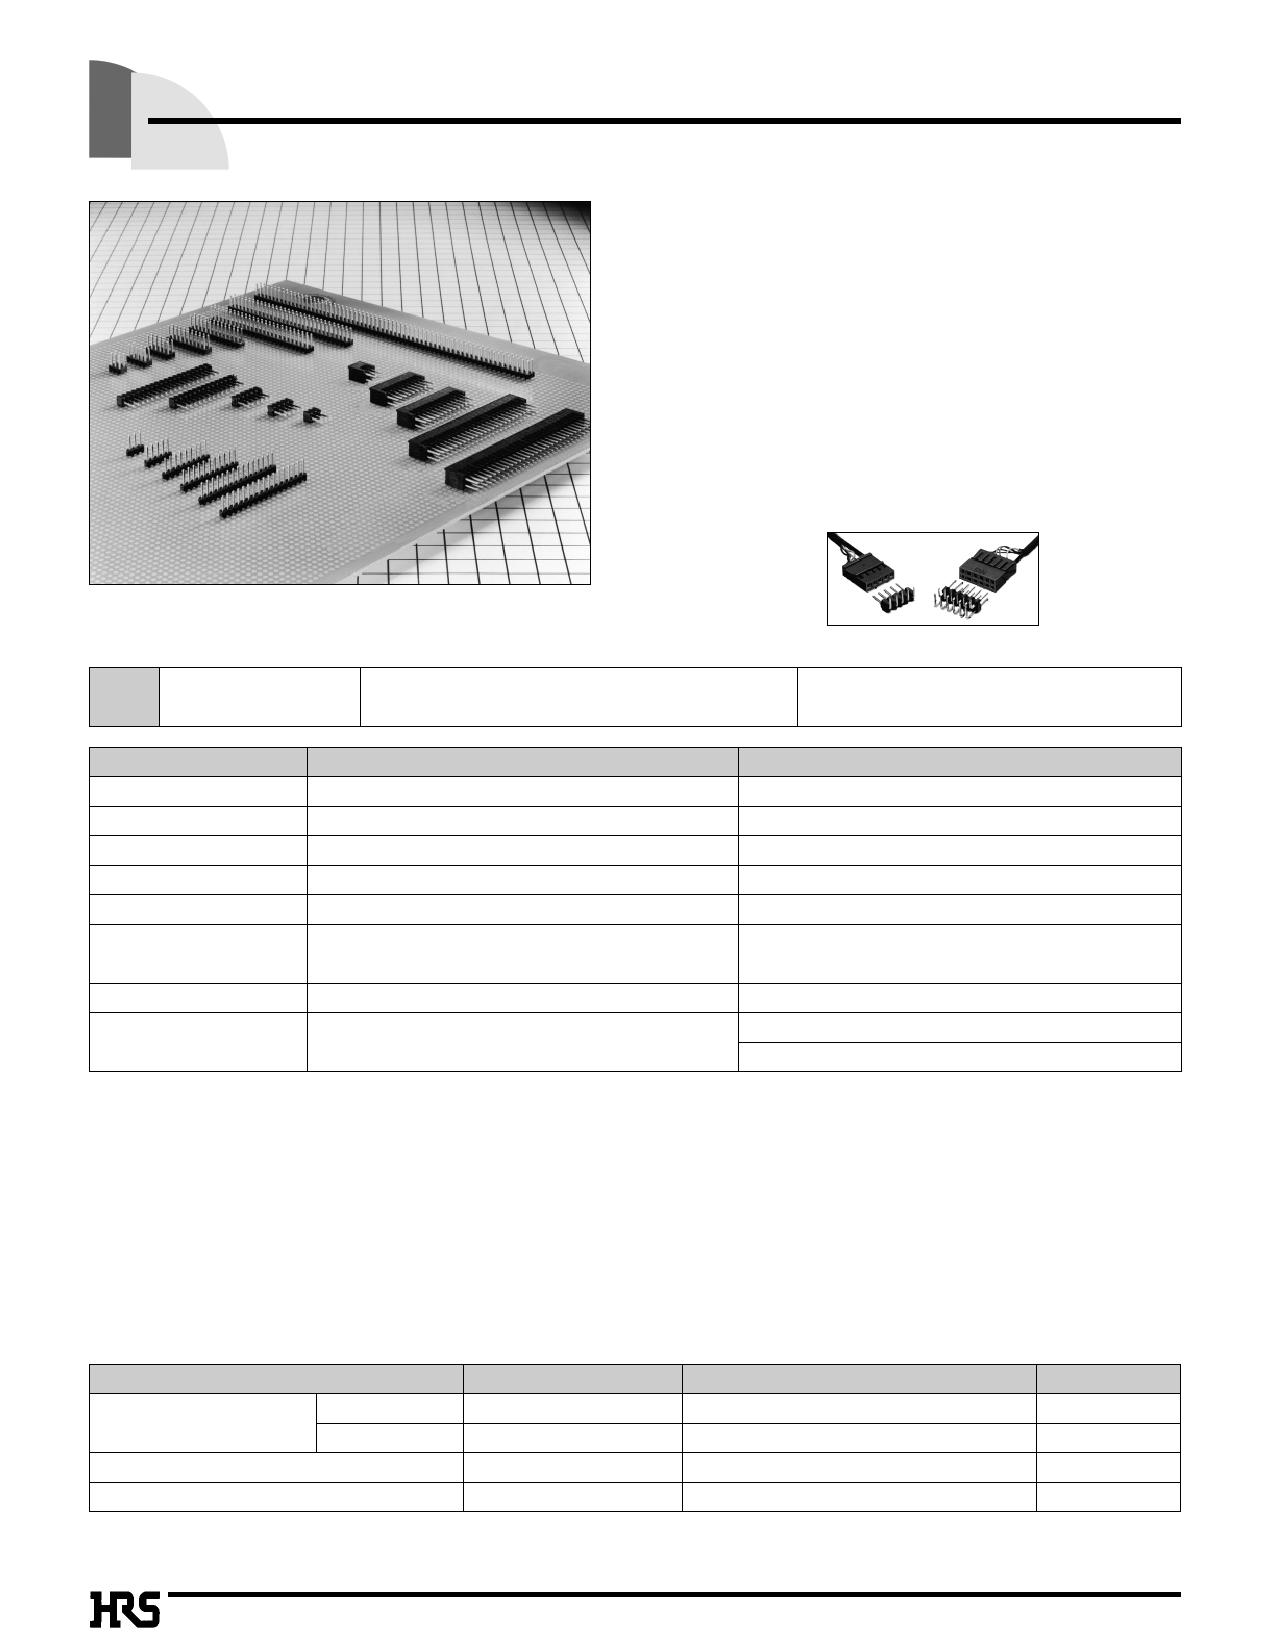 A1-20PA-2.54DS datasheet, circuit